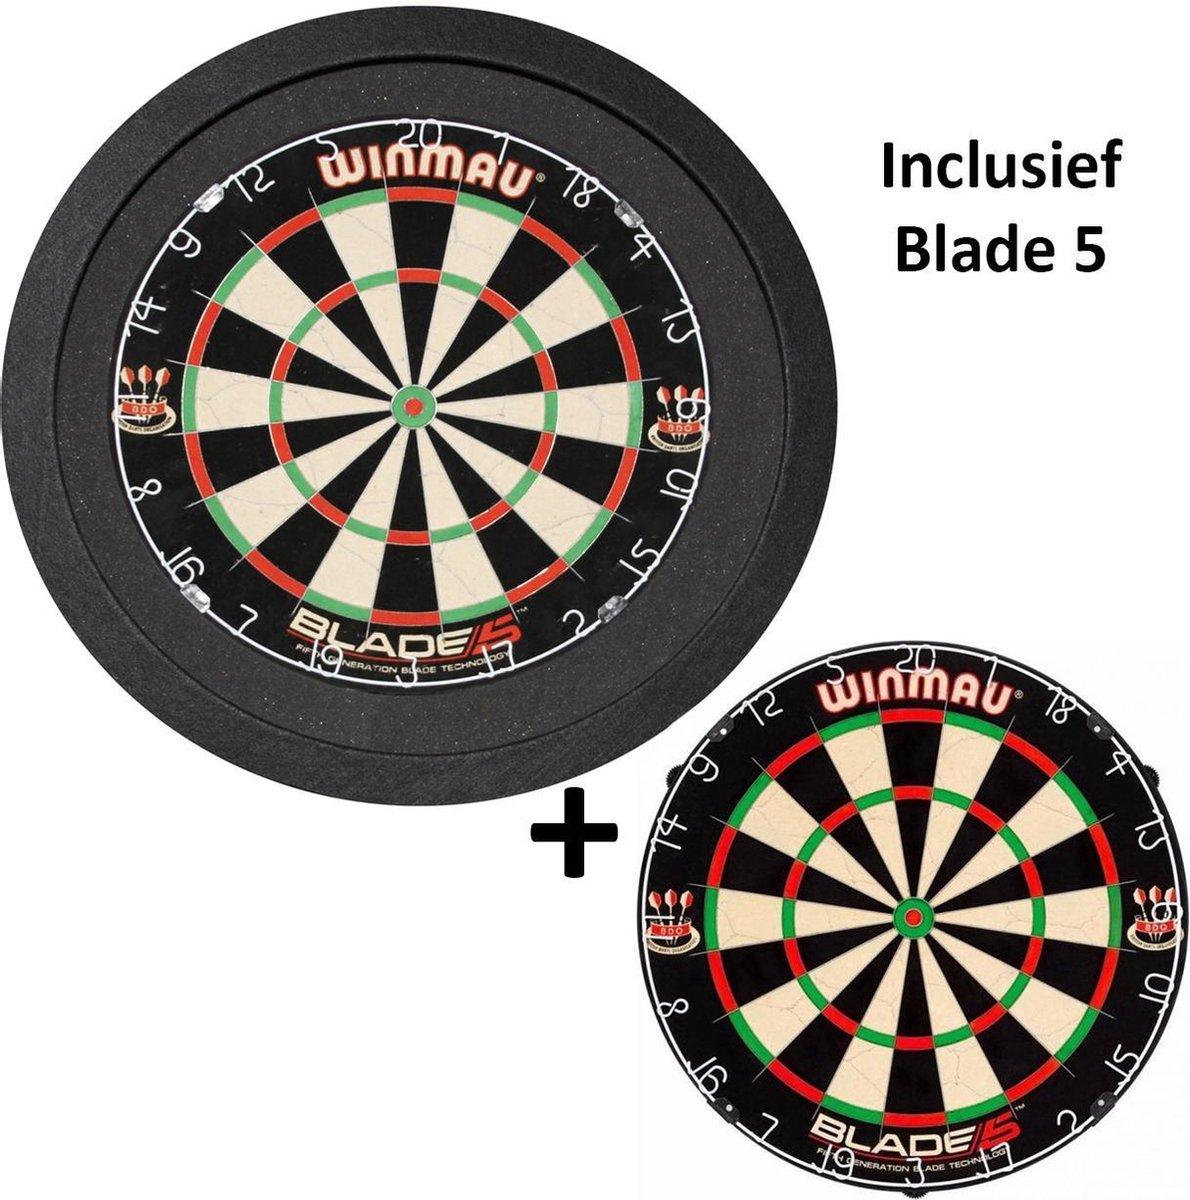 Dragon Darts - TCB X-Ray 3.0 Luxe - dartbord verlichting - surround - inclusief Winmau Blade 5 - dartbord - zwart